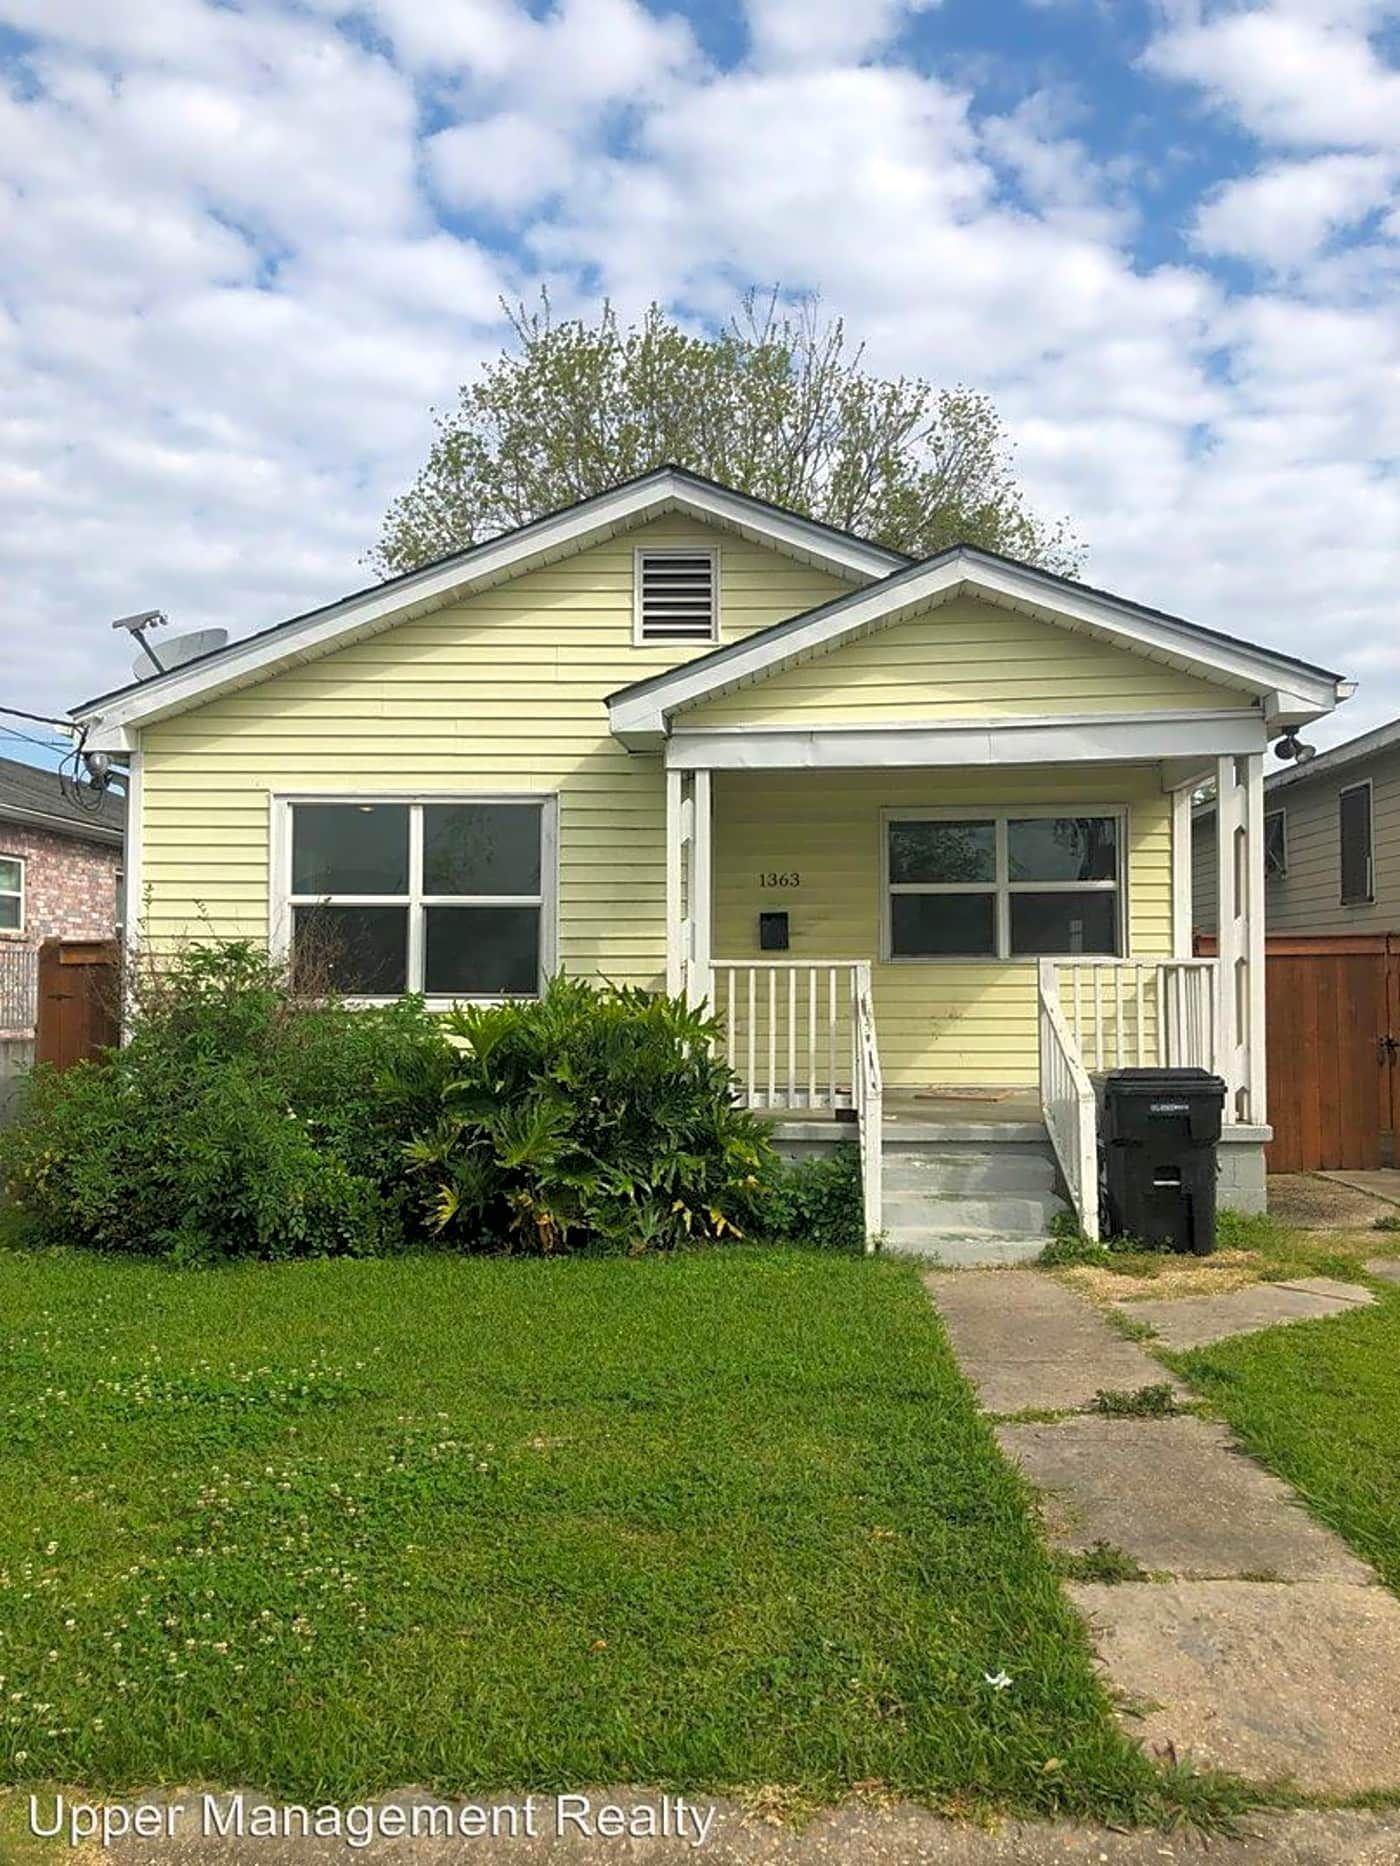 1363 Harrison Ave Harrison Ave New Orleans La Houses For Rent Rent Com Renting A House New Orleans Homes New Orleans Apartment